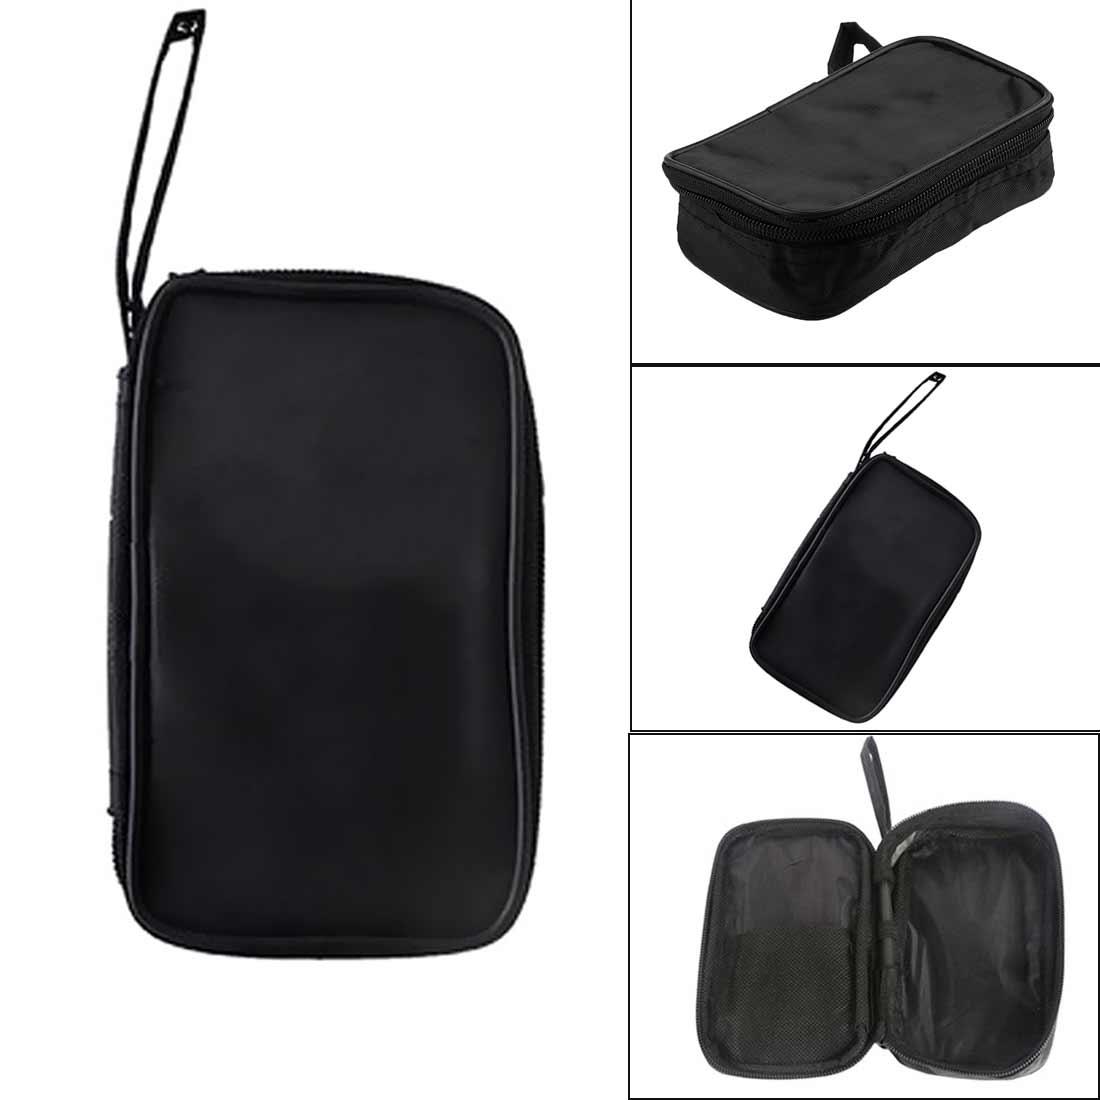 Tool Bag 23x14x5cm Multimeter Black Colth Bag Durable Waterproof Shockproof Soft Case Tool Bag 23x14x5cm Multimeter Black Colth Bag Durable Waterproof Shockproof Soft Case